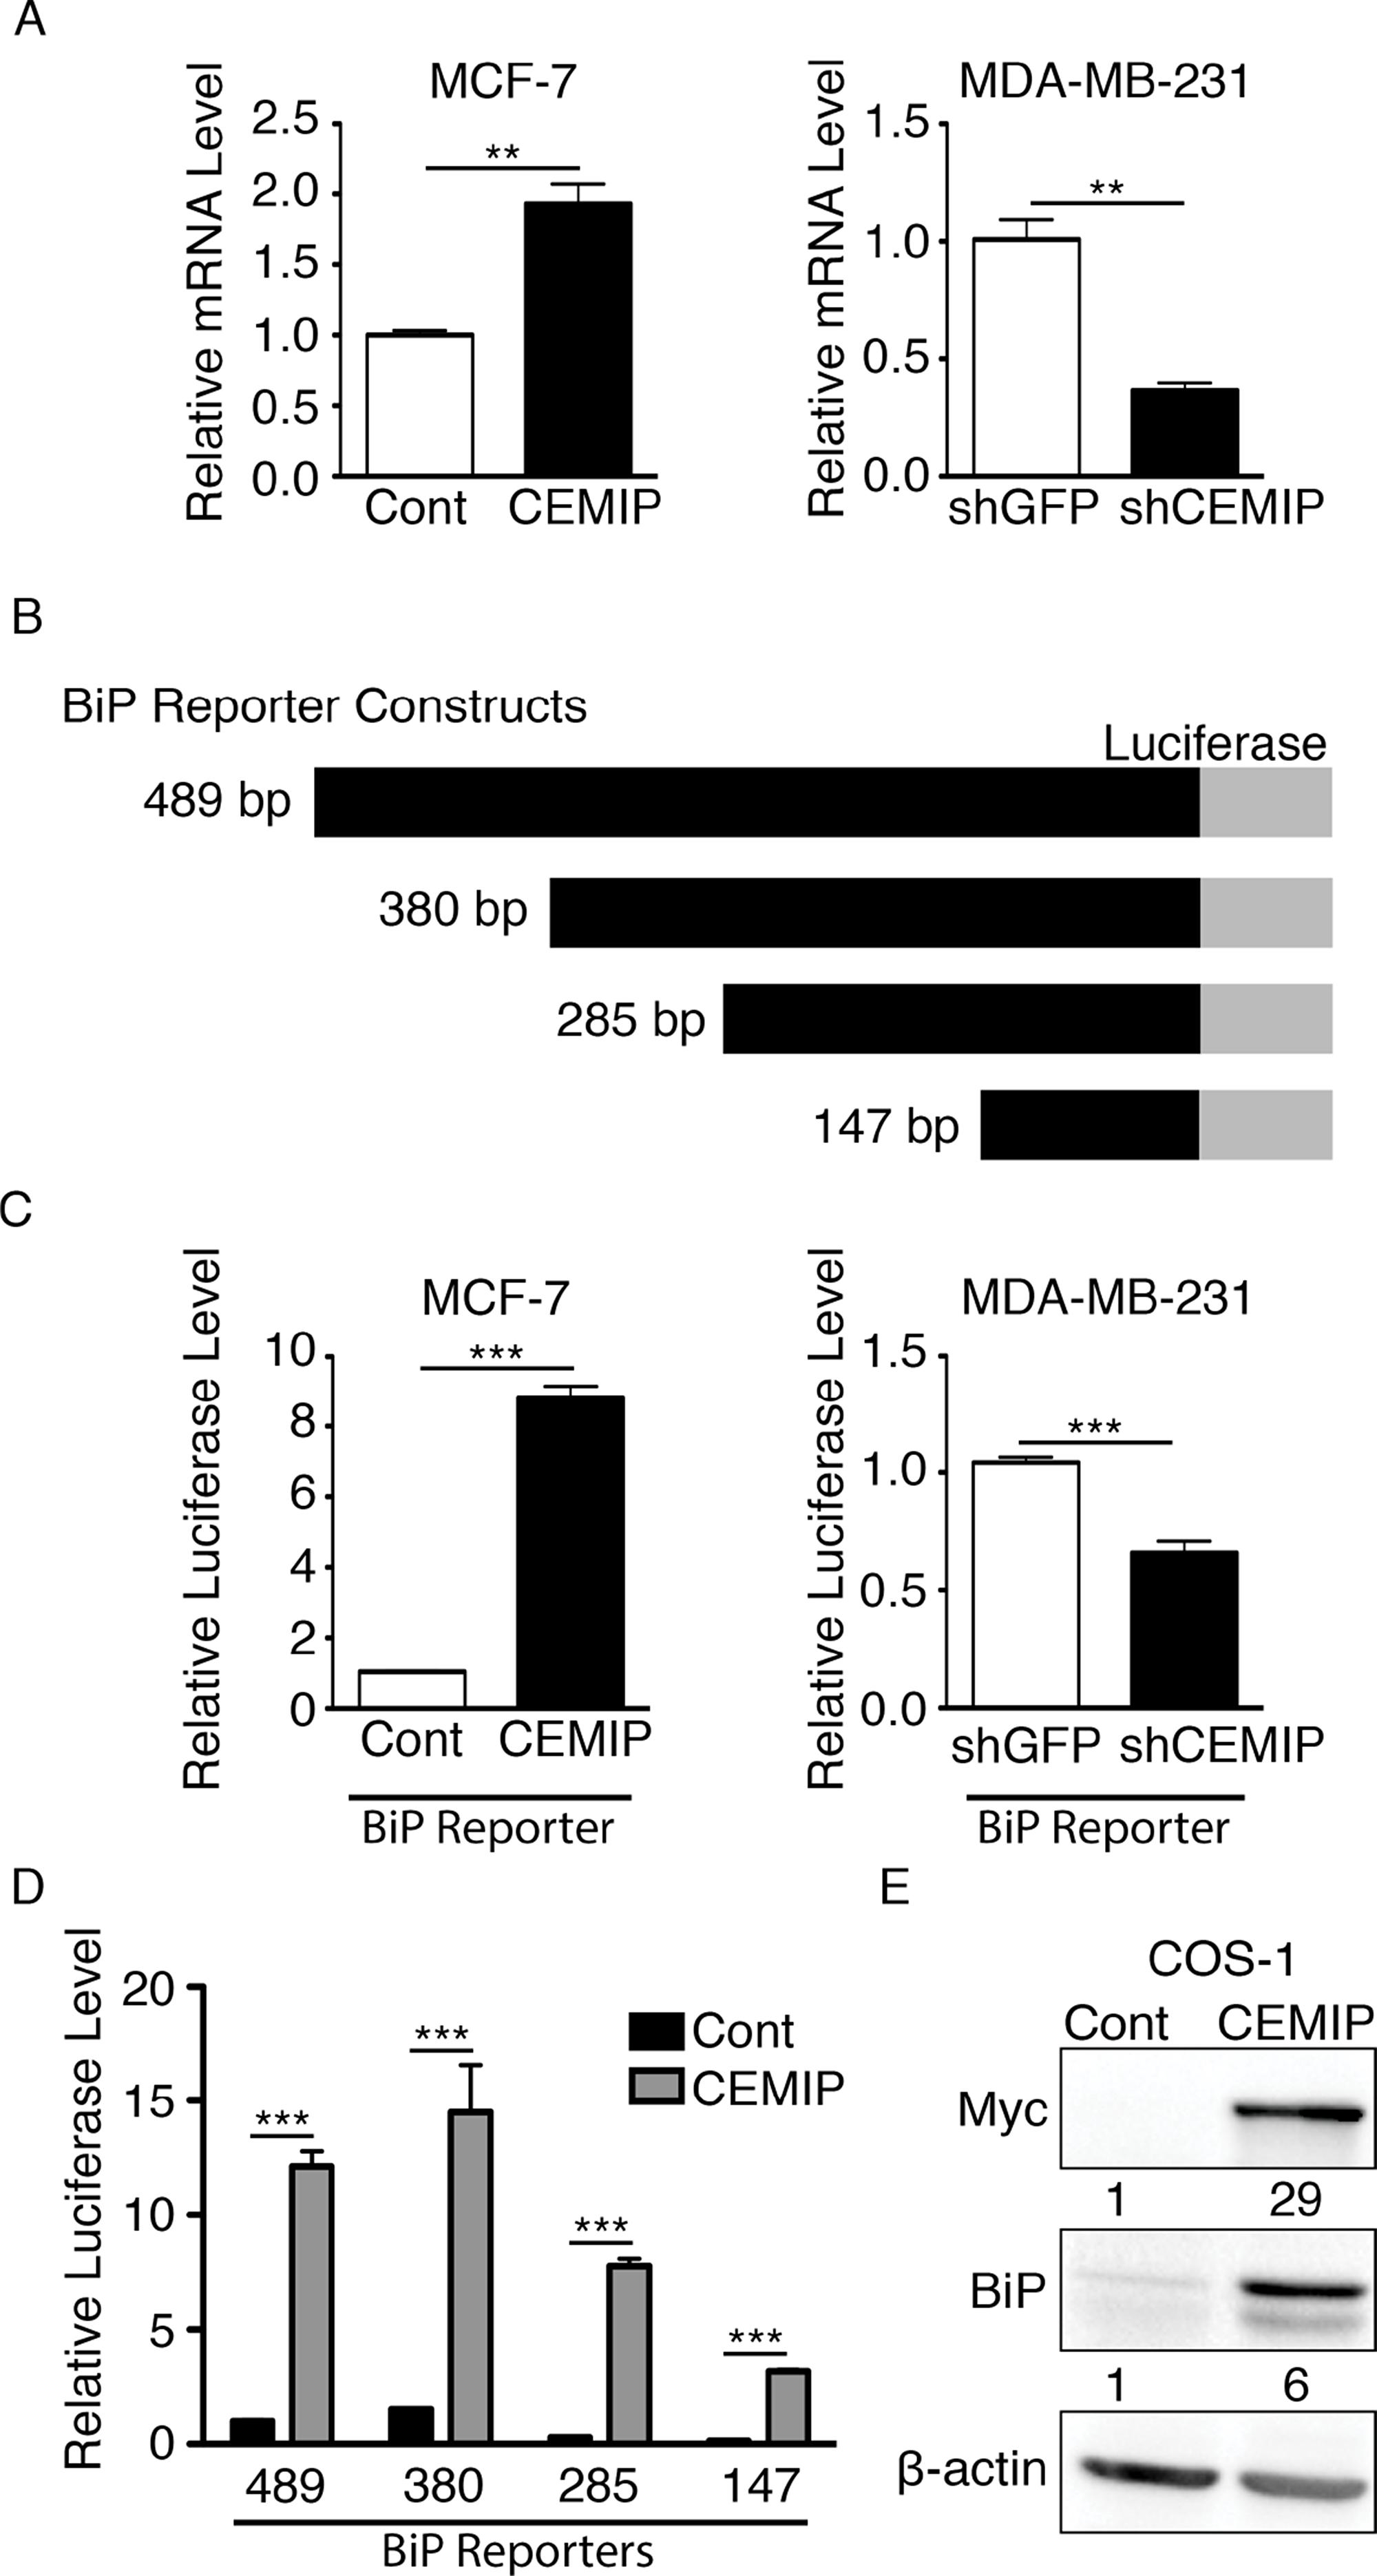 CEMIP upregulates BiP transcription through a minimal BiP promoter region.